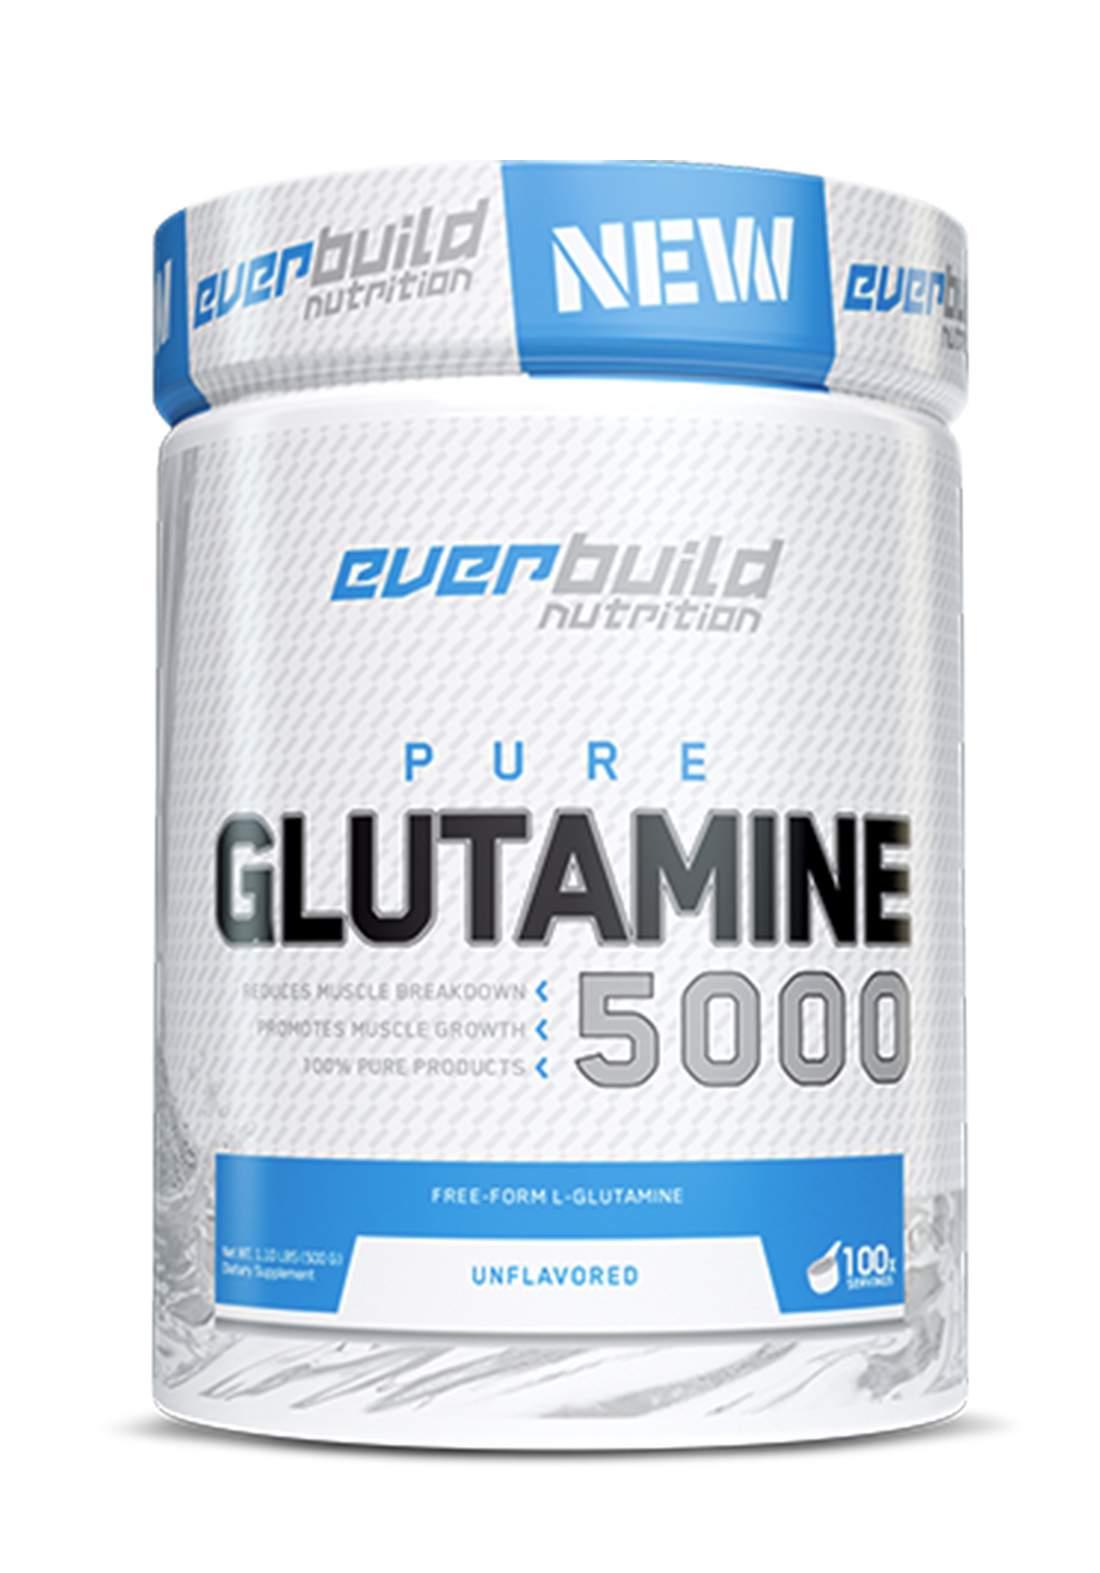 Everbuild Nutrition Glutamine 5000 500g مكمل الجلوتامين الغذائي